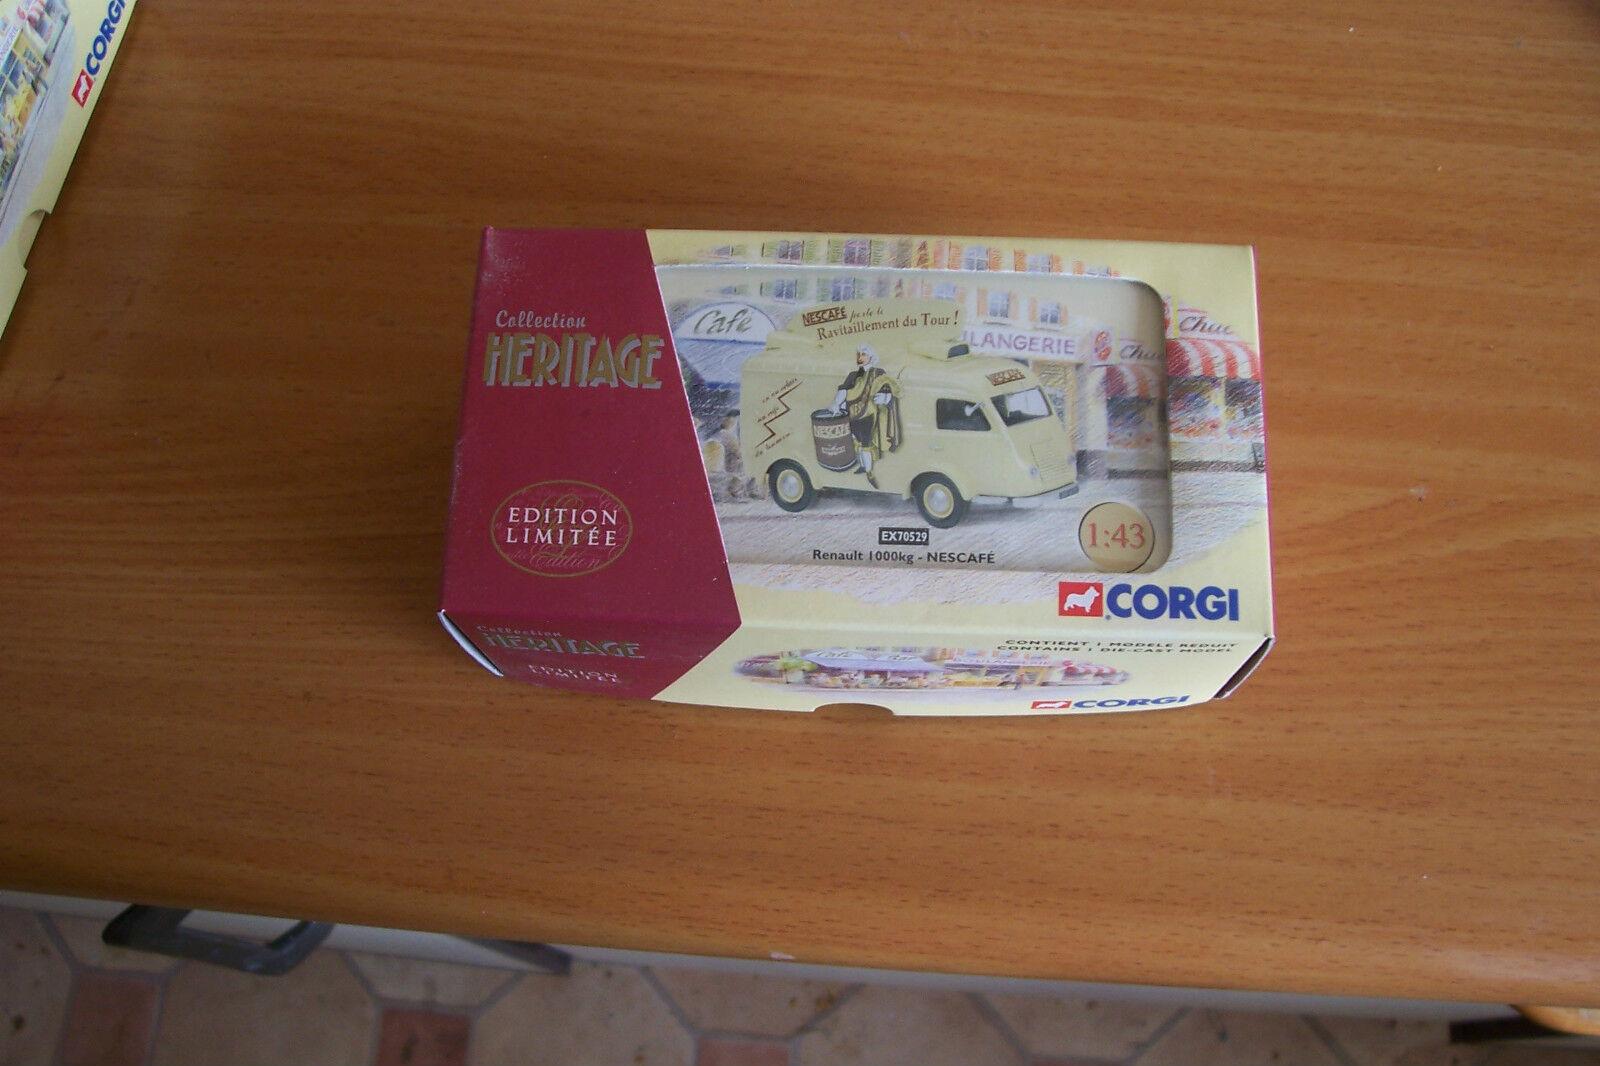 CORGI 1 43 EX70529 Ricqles Renault vintage van van van d343f2